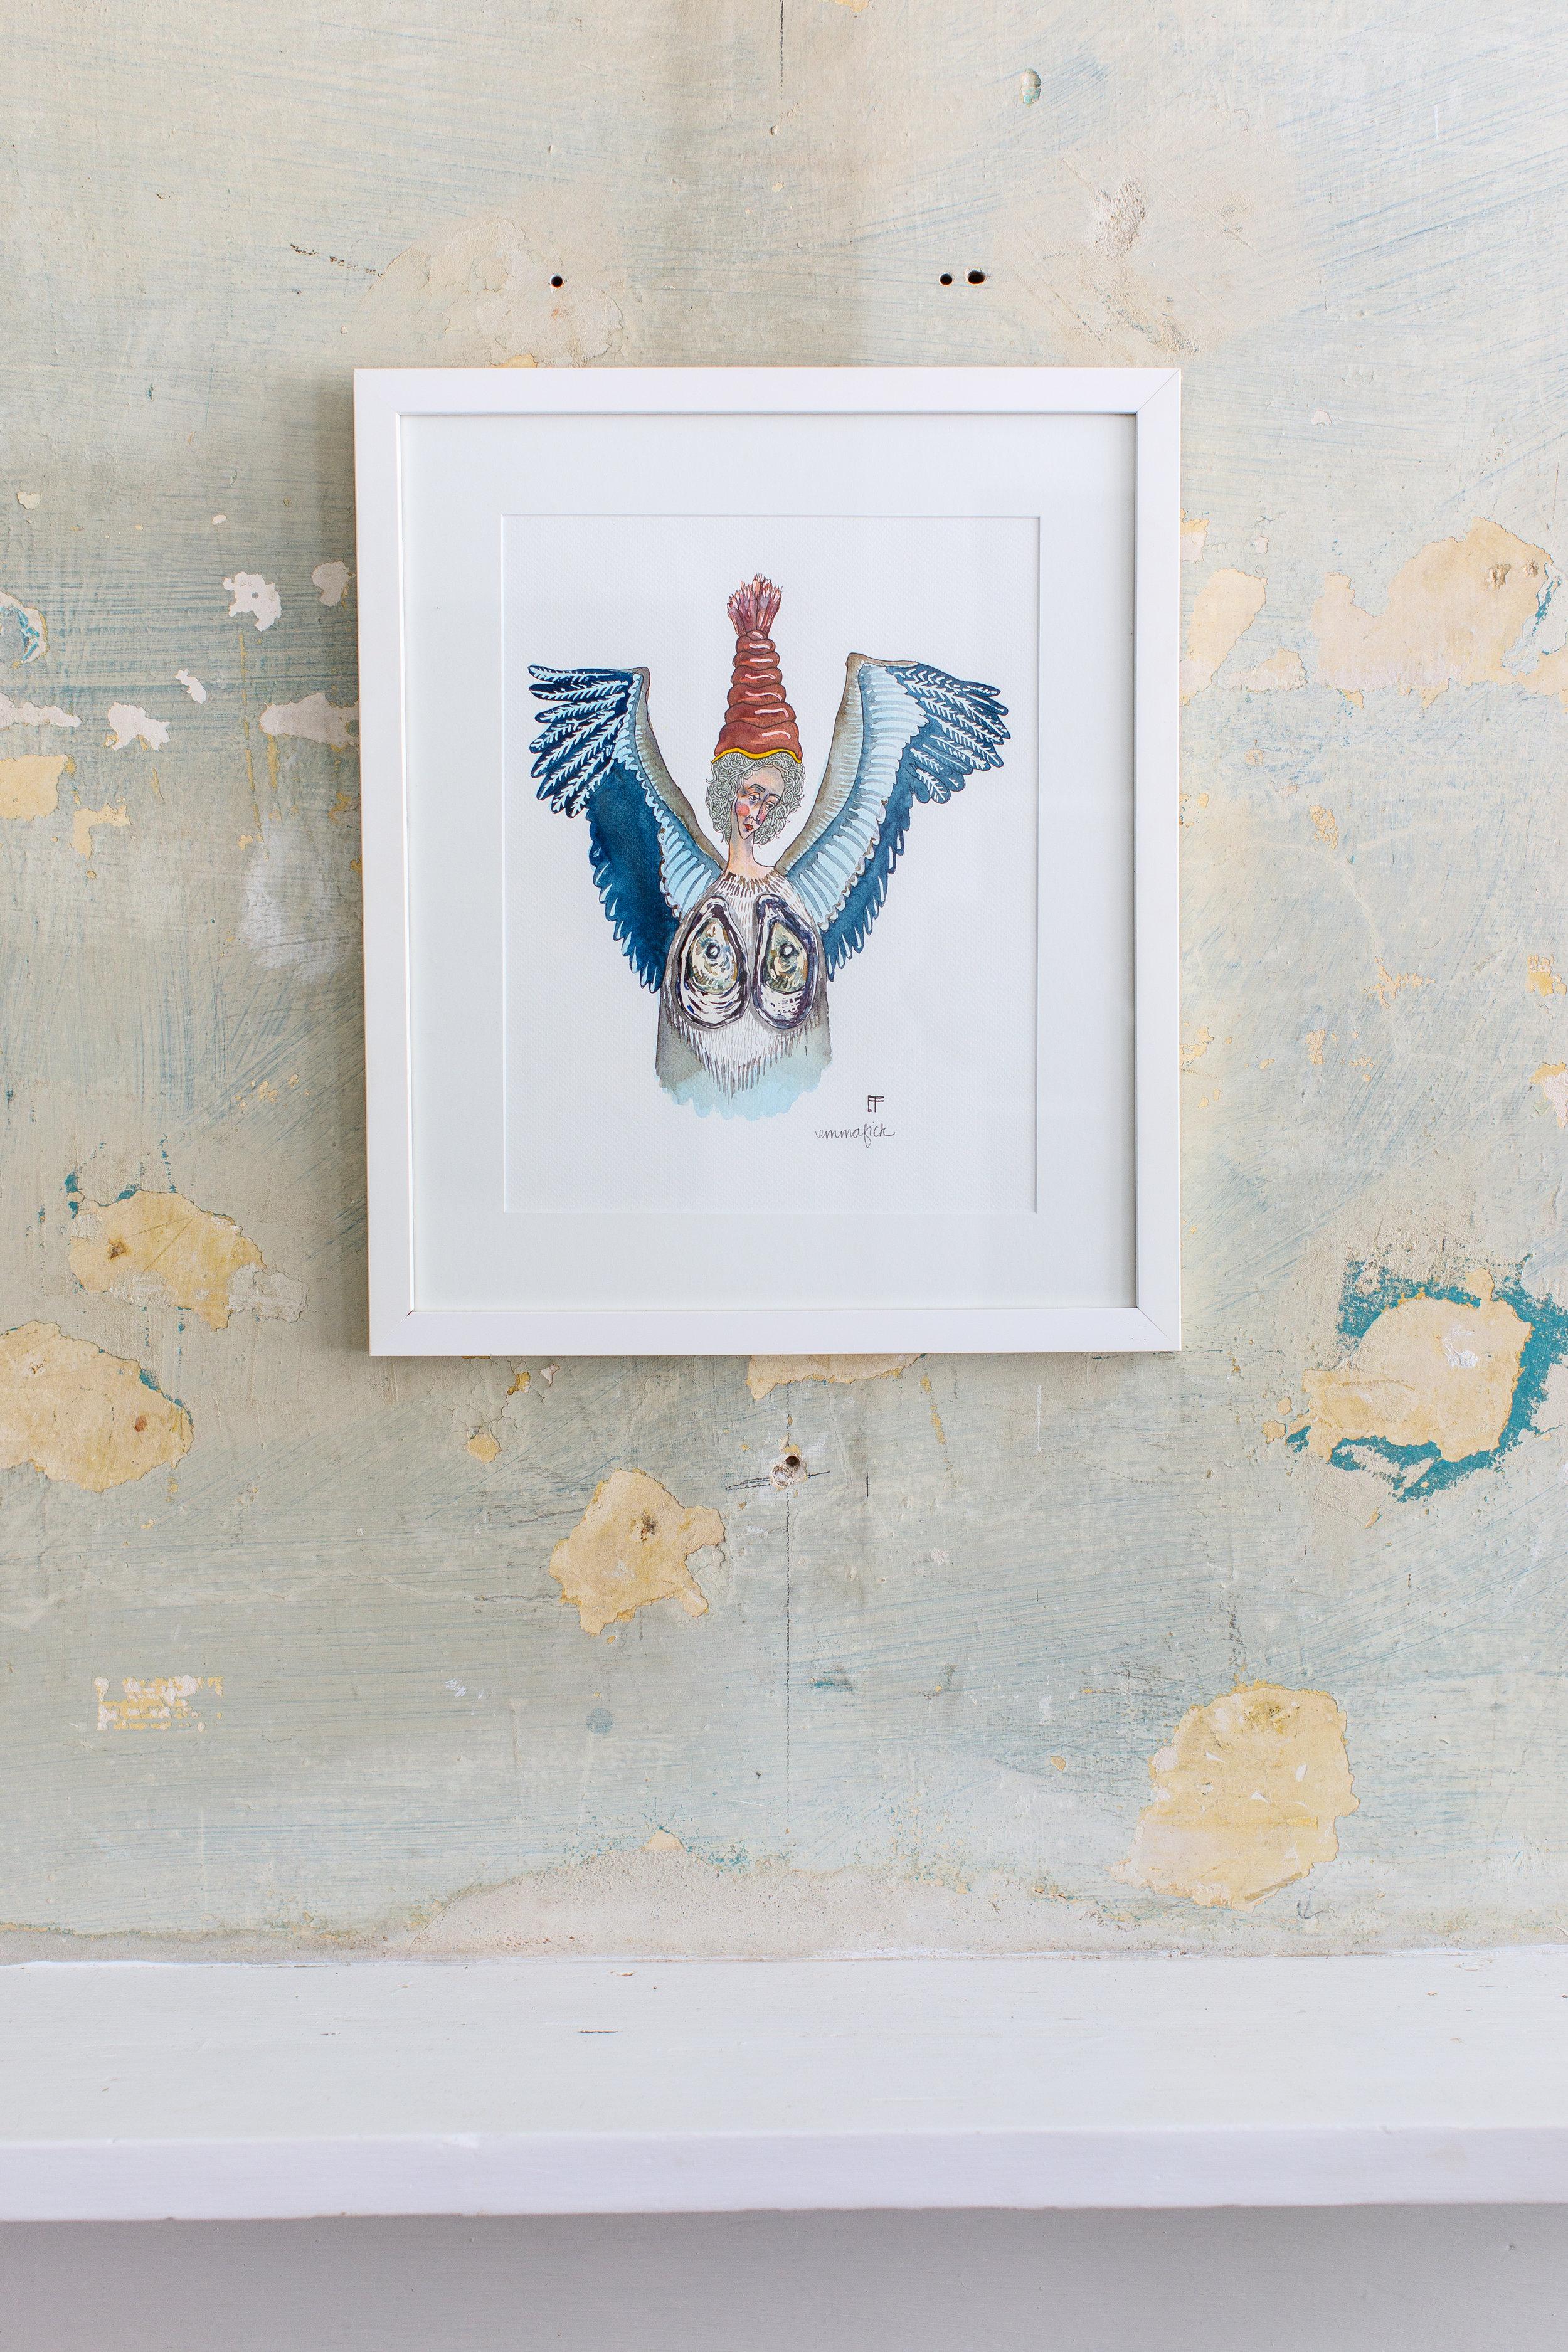 Emma-Fick-New-Orleans-Artist-Illustration-025.jpg